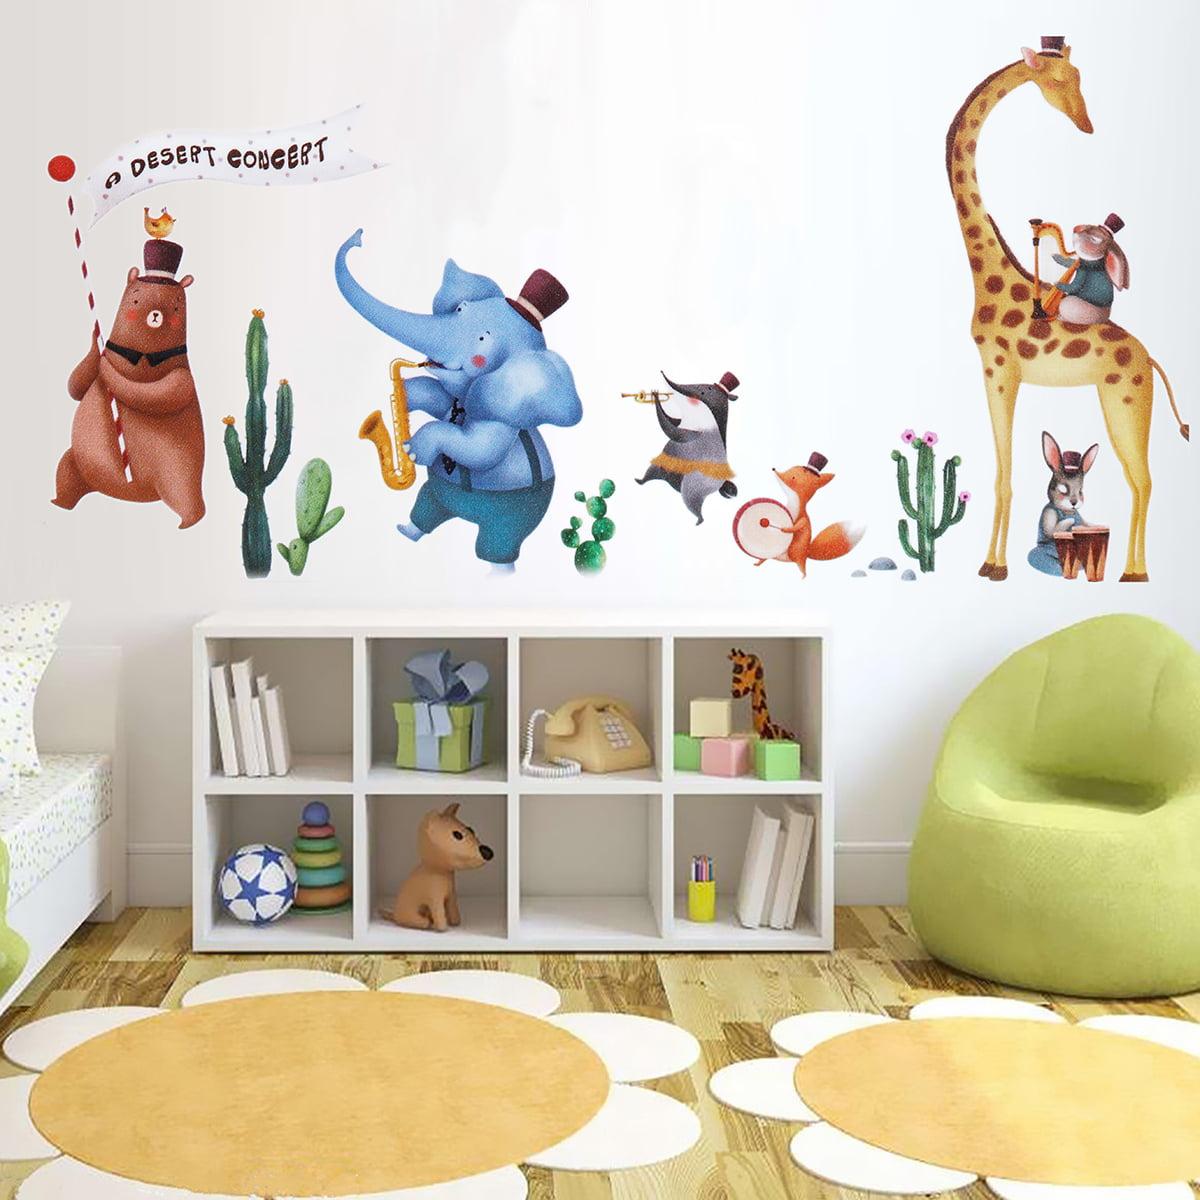 Cute Diy Wall Decals Elephant Animals Wall Sticker Decal Child Kids Nursery Baby Room Decor Removable Walmart Com Walmart Com